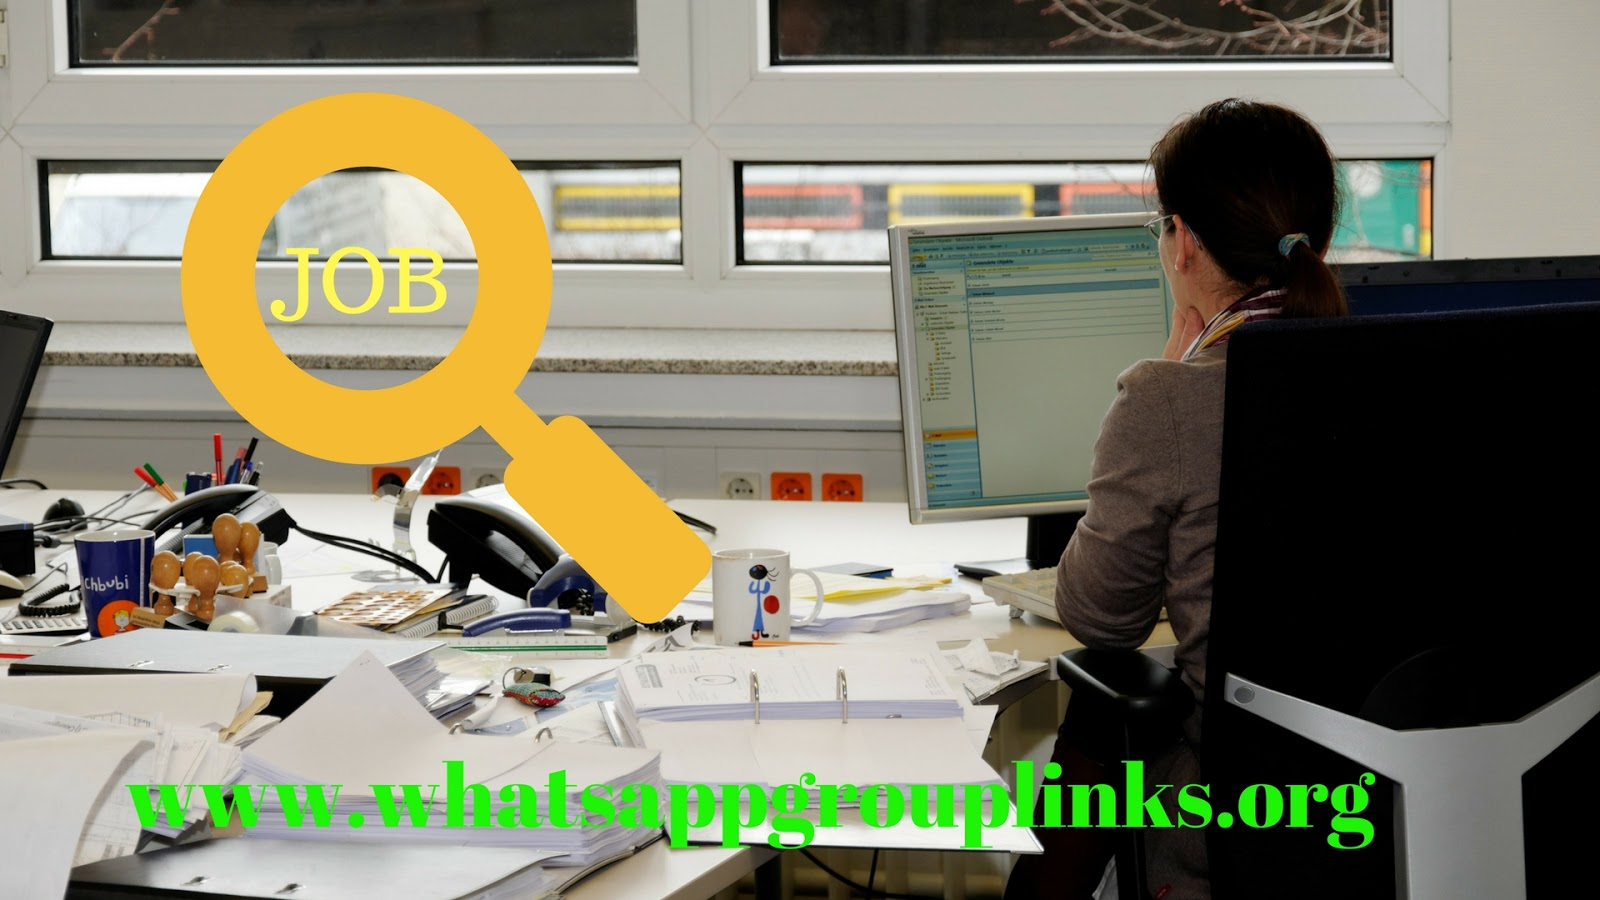 JOIN 1000+ JOB WHATSAPP GROUP LINKS LIST - Whatsapp Group Links